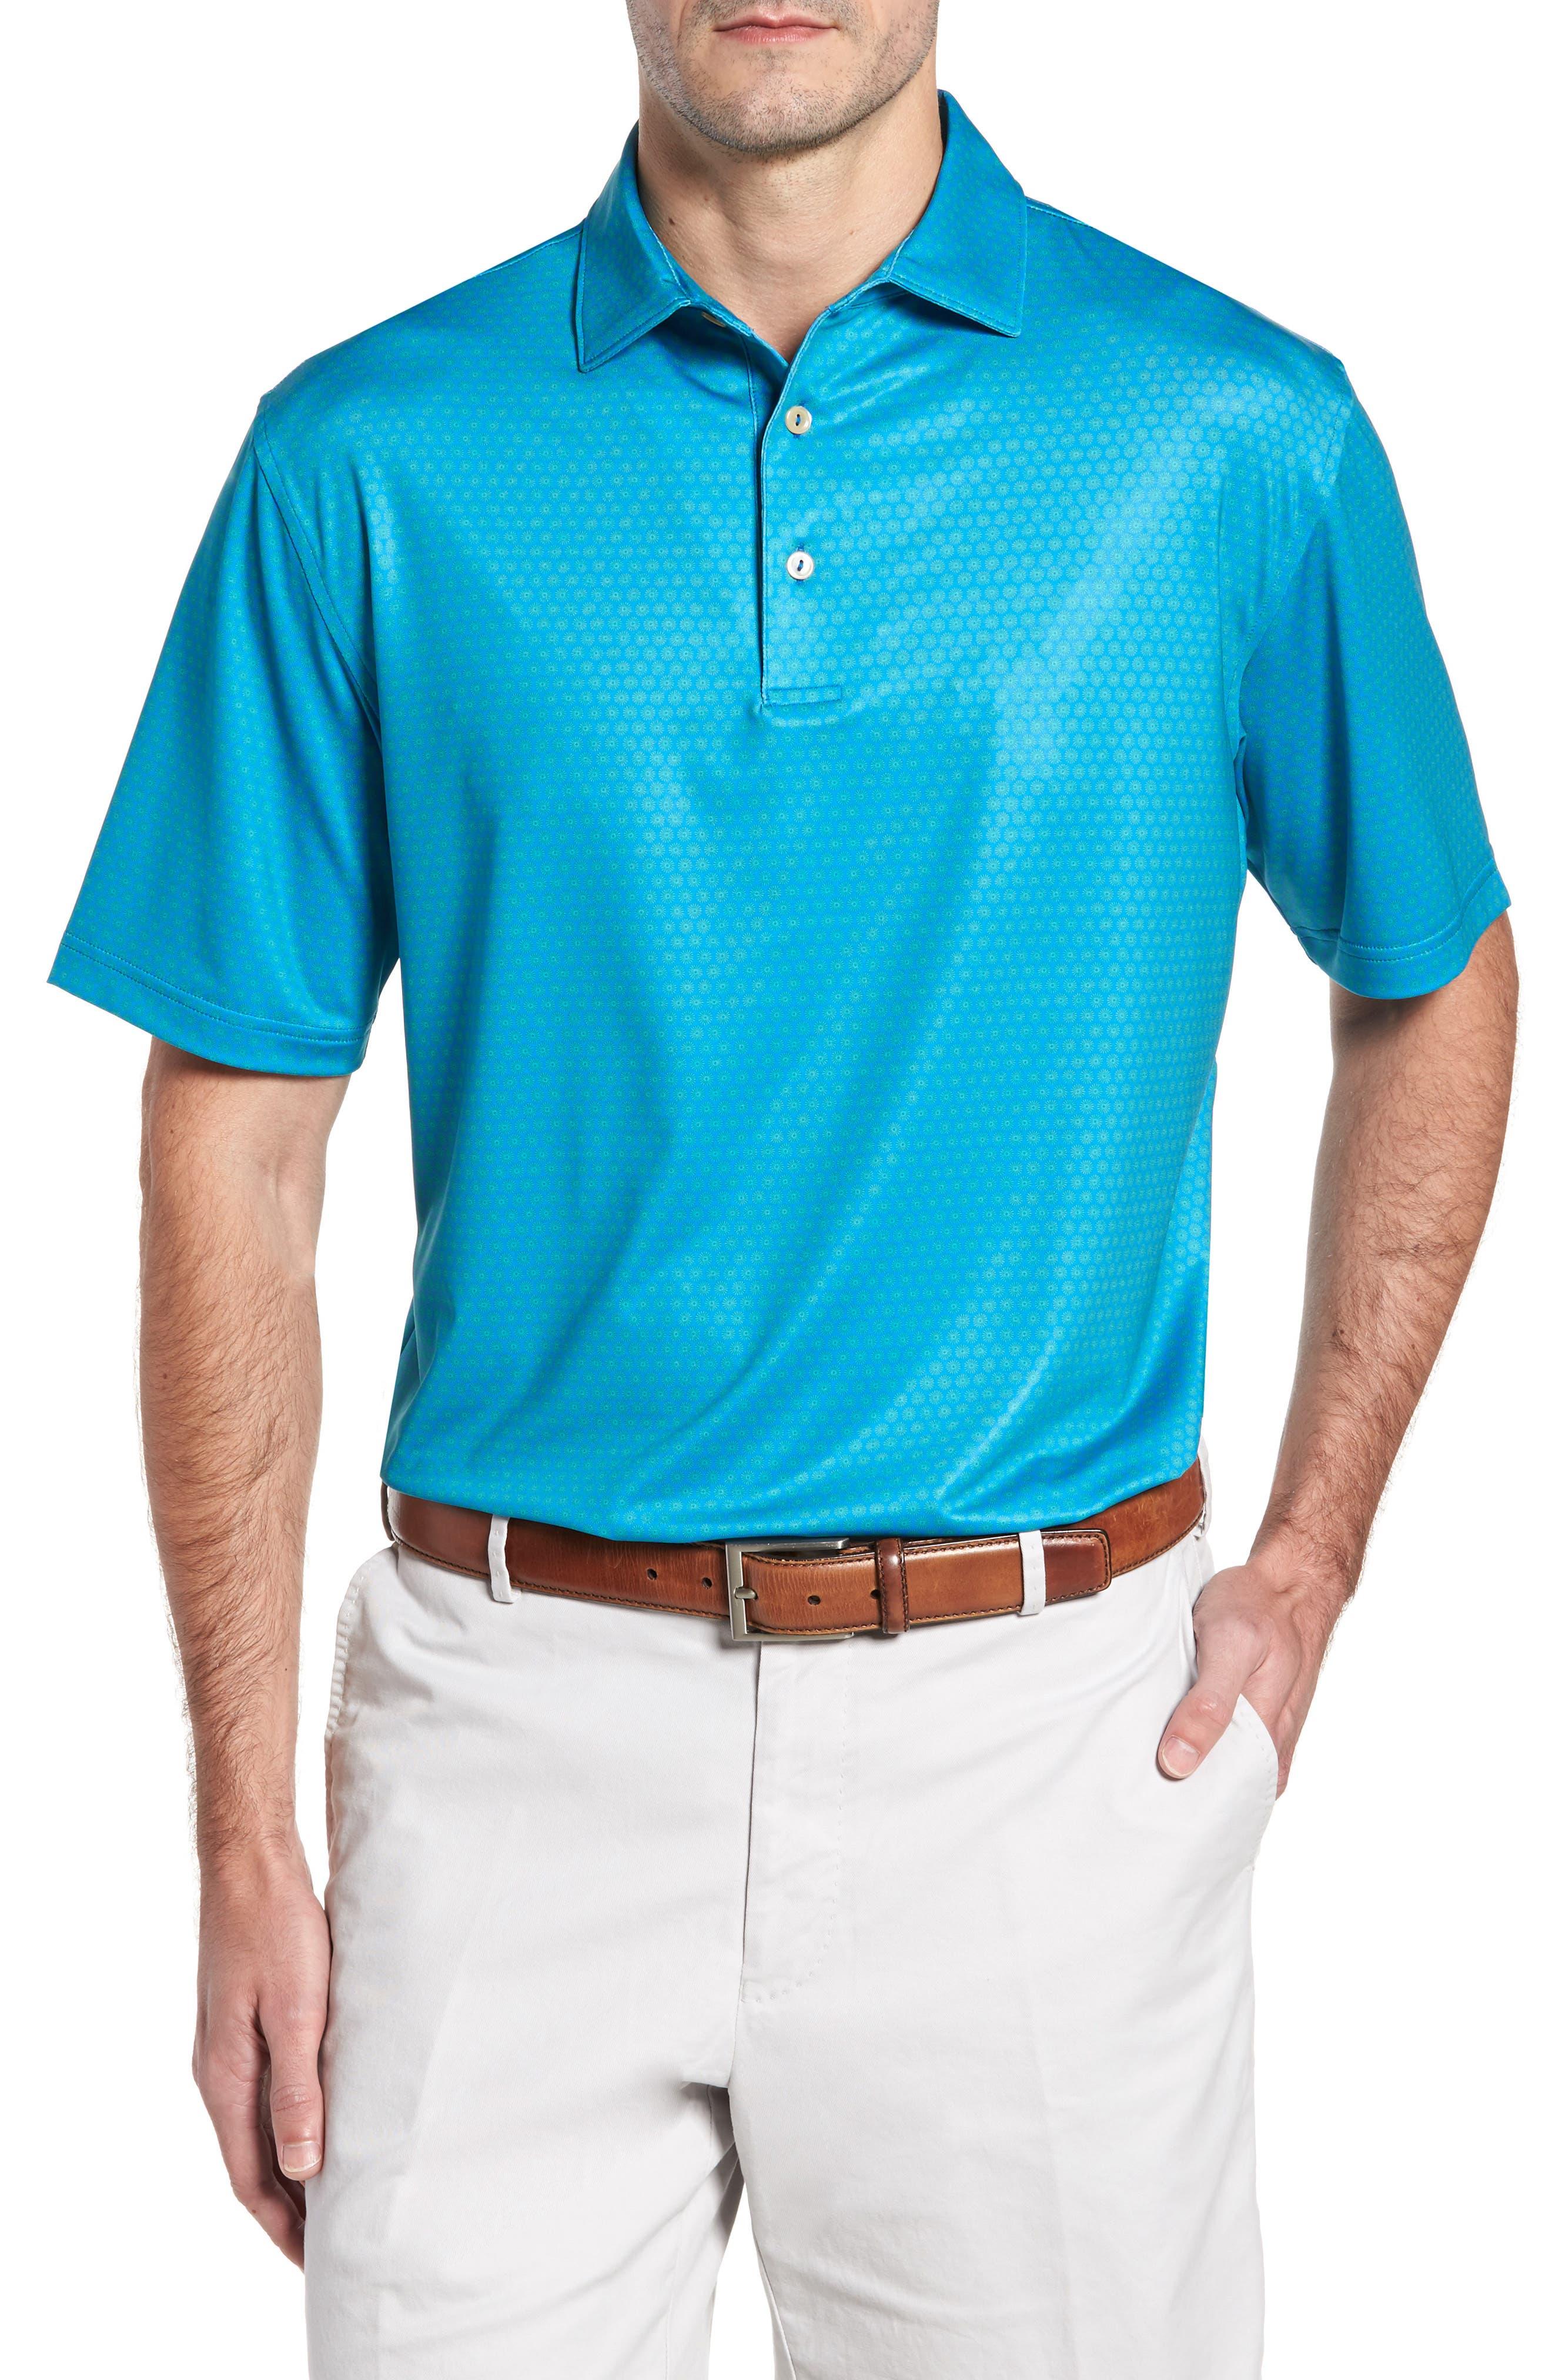 Sean Mata Sunburst Stretch Jersey Polo,                             Main thumbnail 1, color,                             403